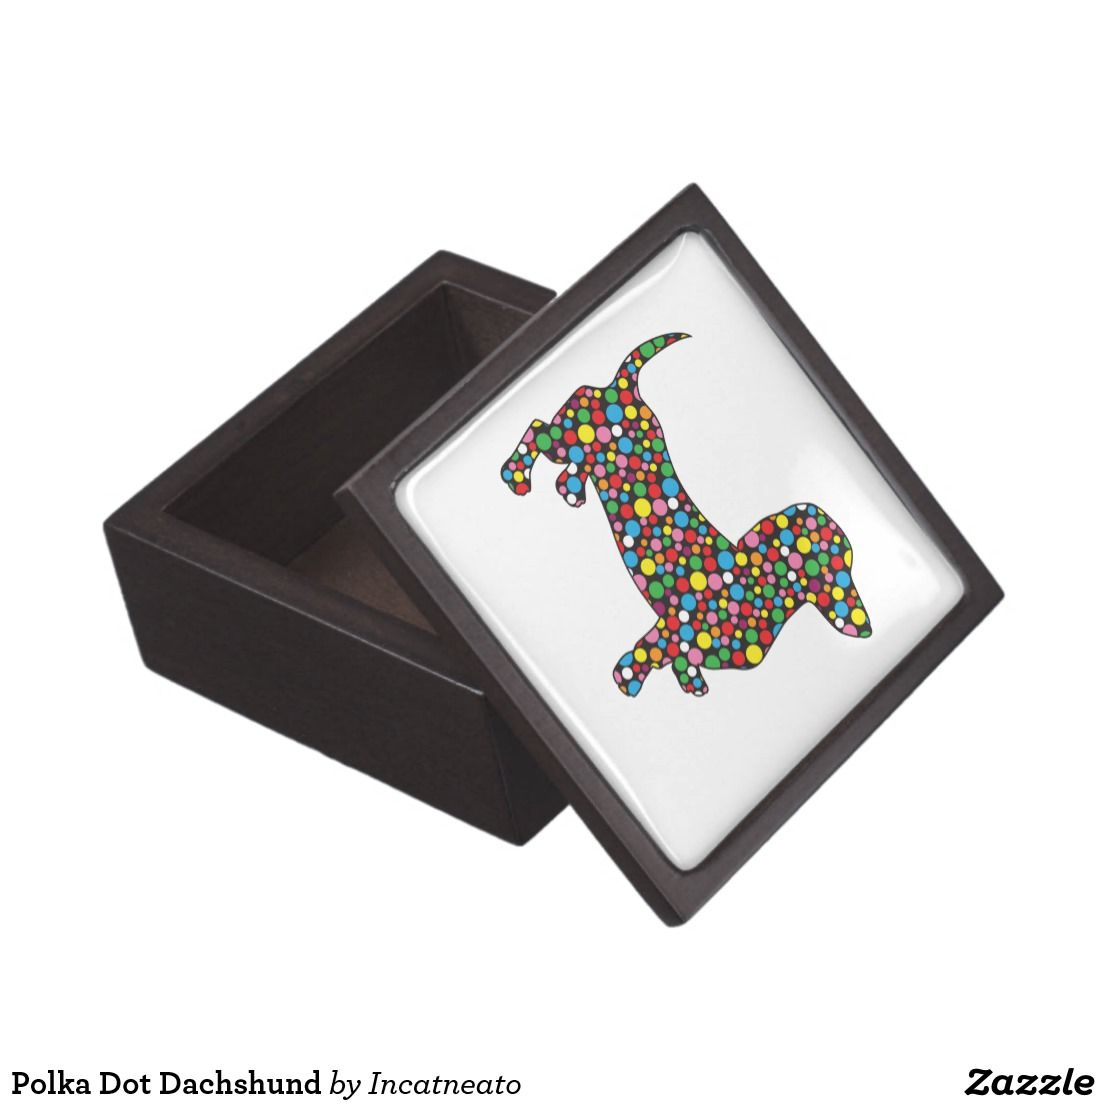 Polka Dot Dachshund Jewelry Box Roseanns fun stuff to buy